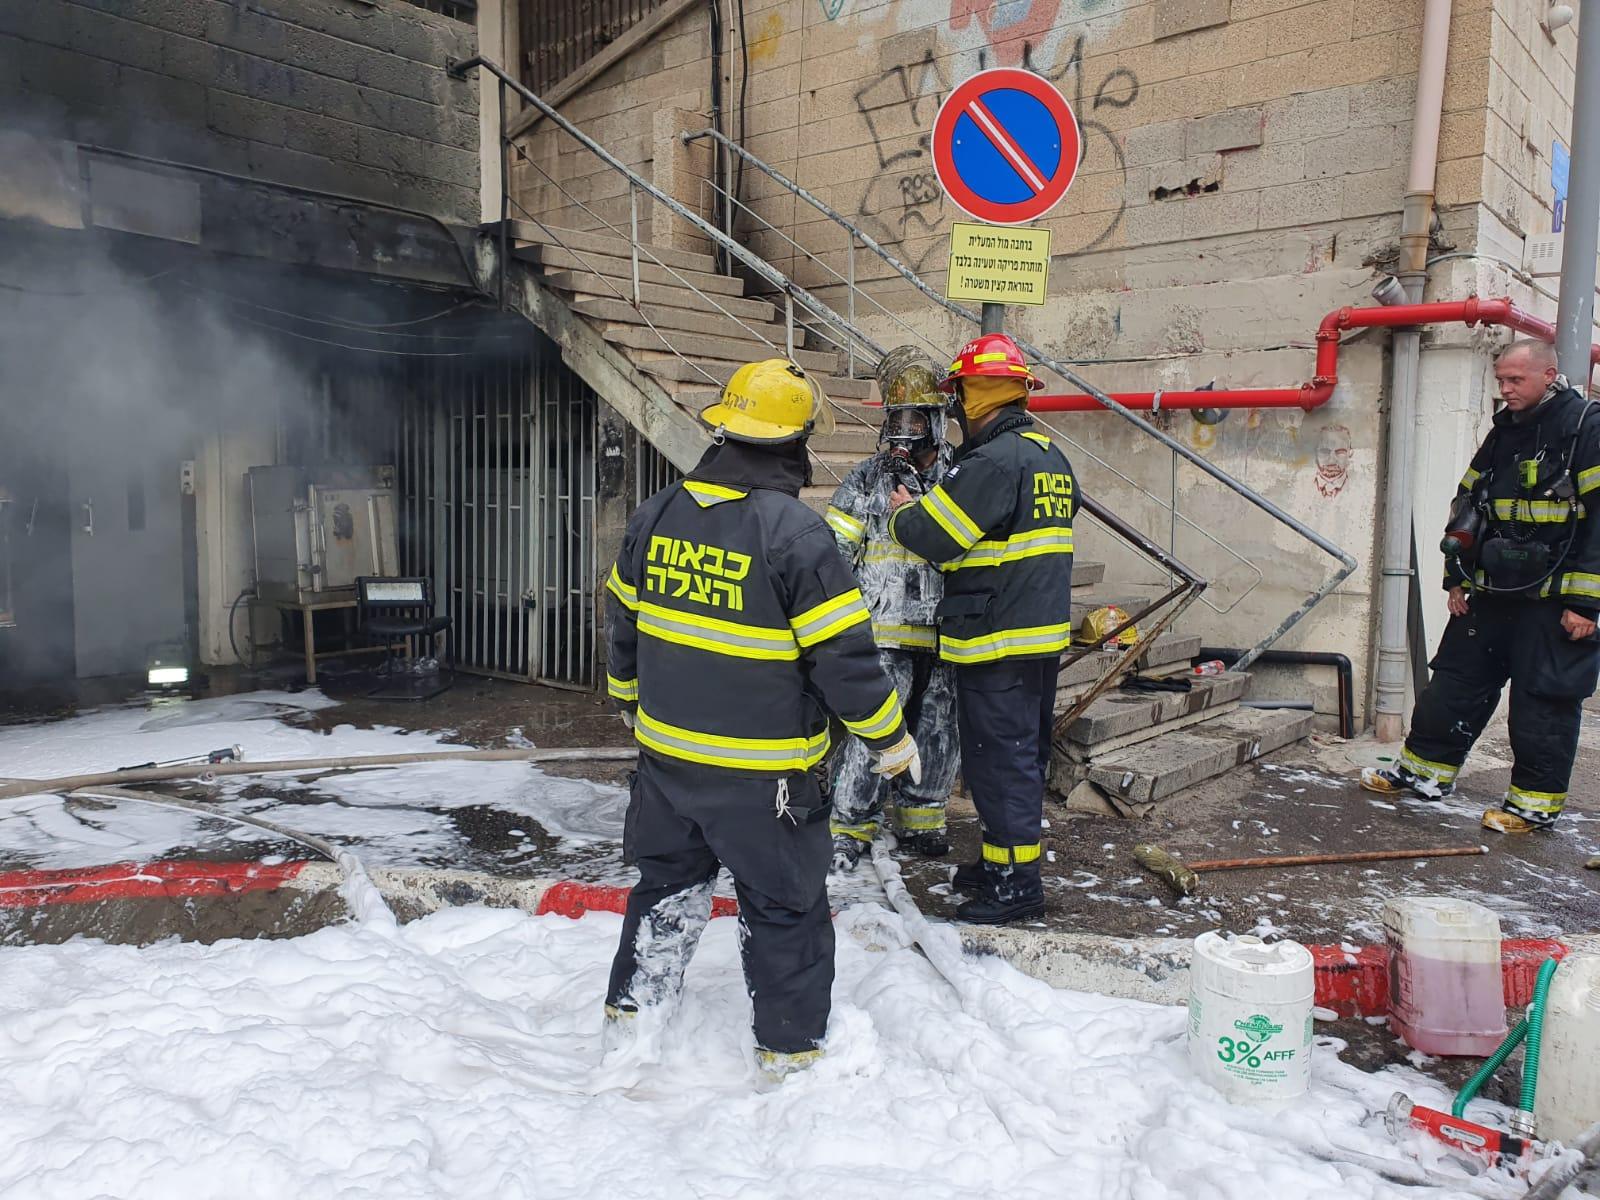 "Photo of שריפה גדולה במחסן צעצועים תת קרקעי ברחוב שביל המפעל בת""א. כמה רחובות נסגרו לתנועה"